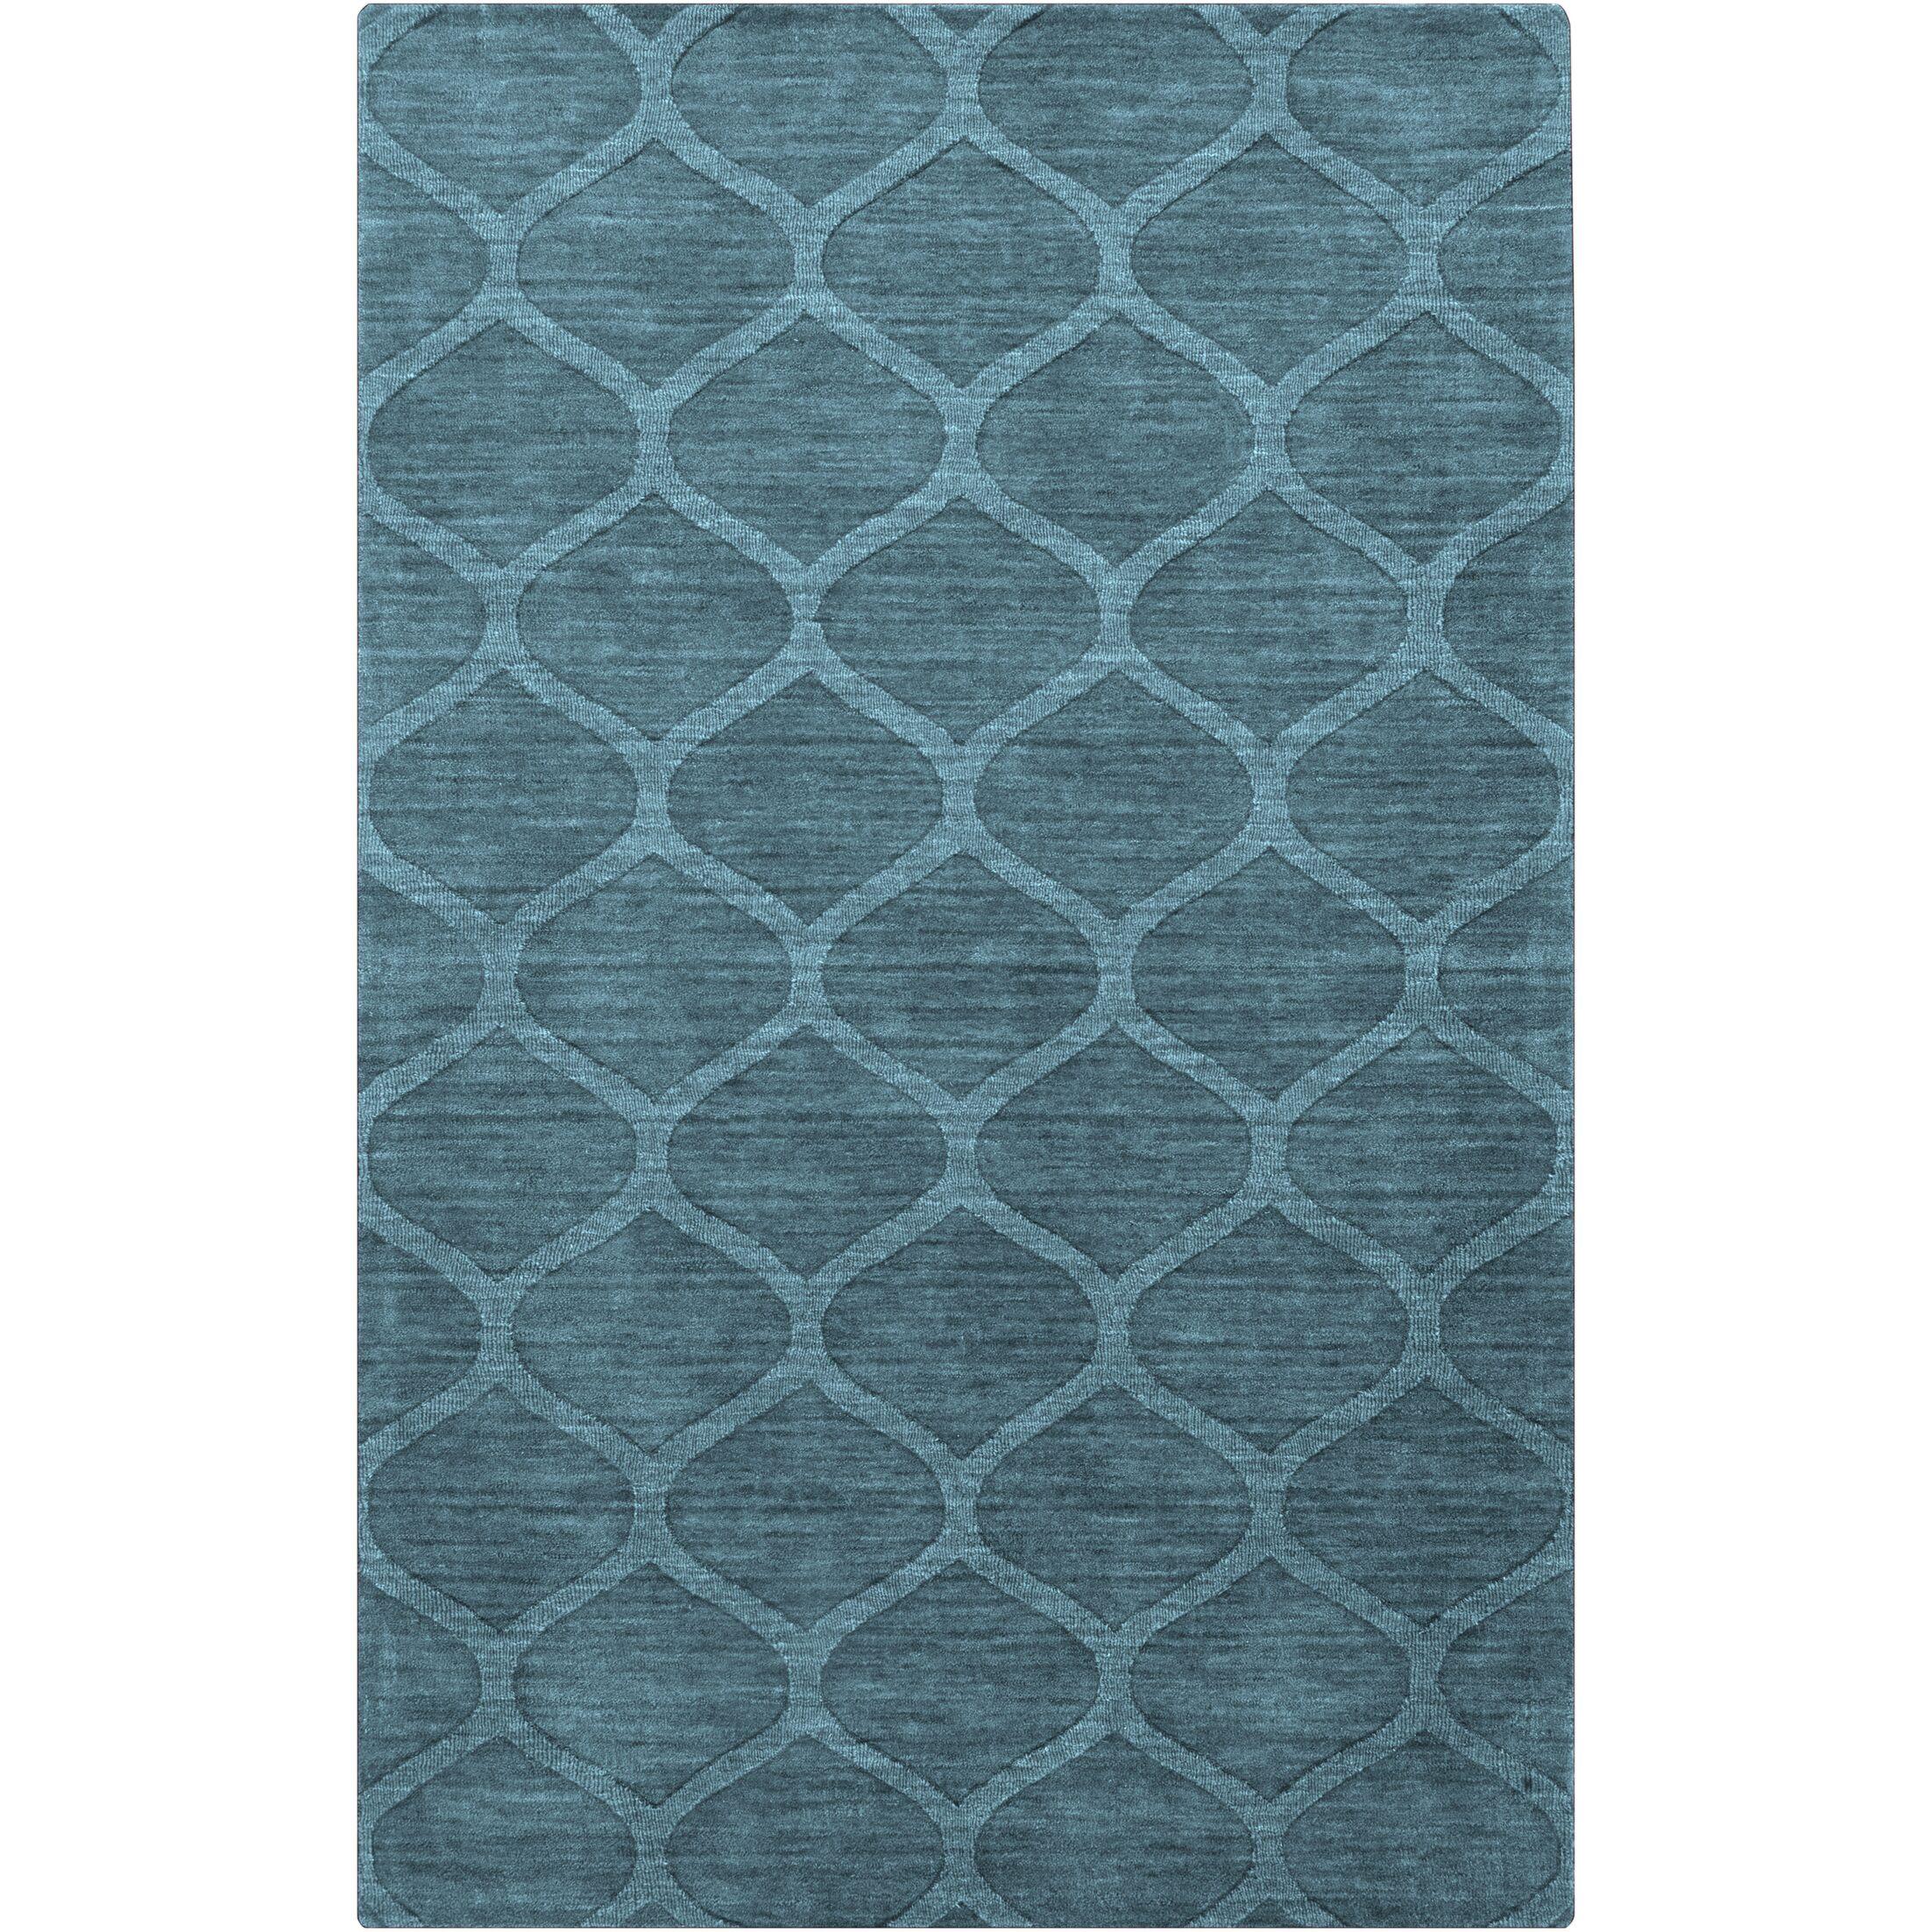 Loewen Hand-Loomed Teal Area Rug Rug Size: Rectangle 8' x 11'